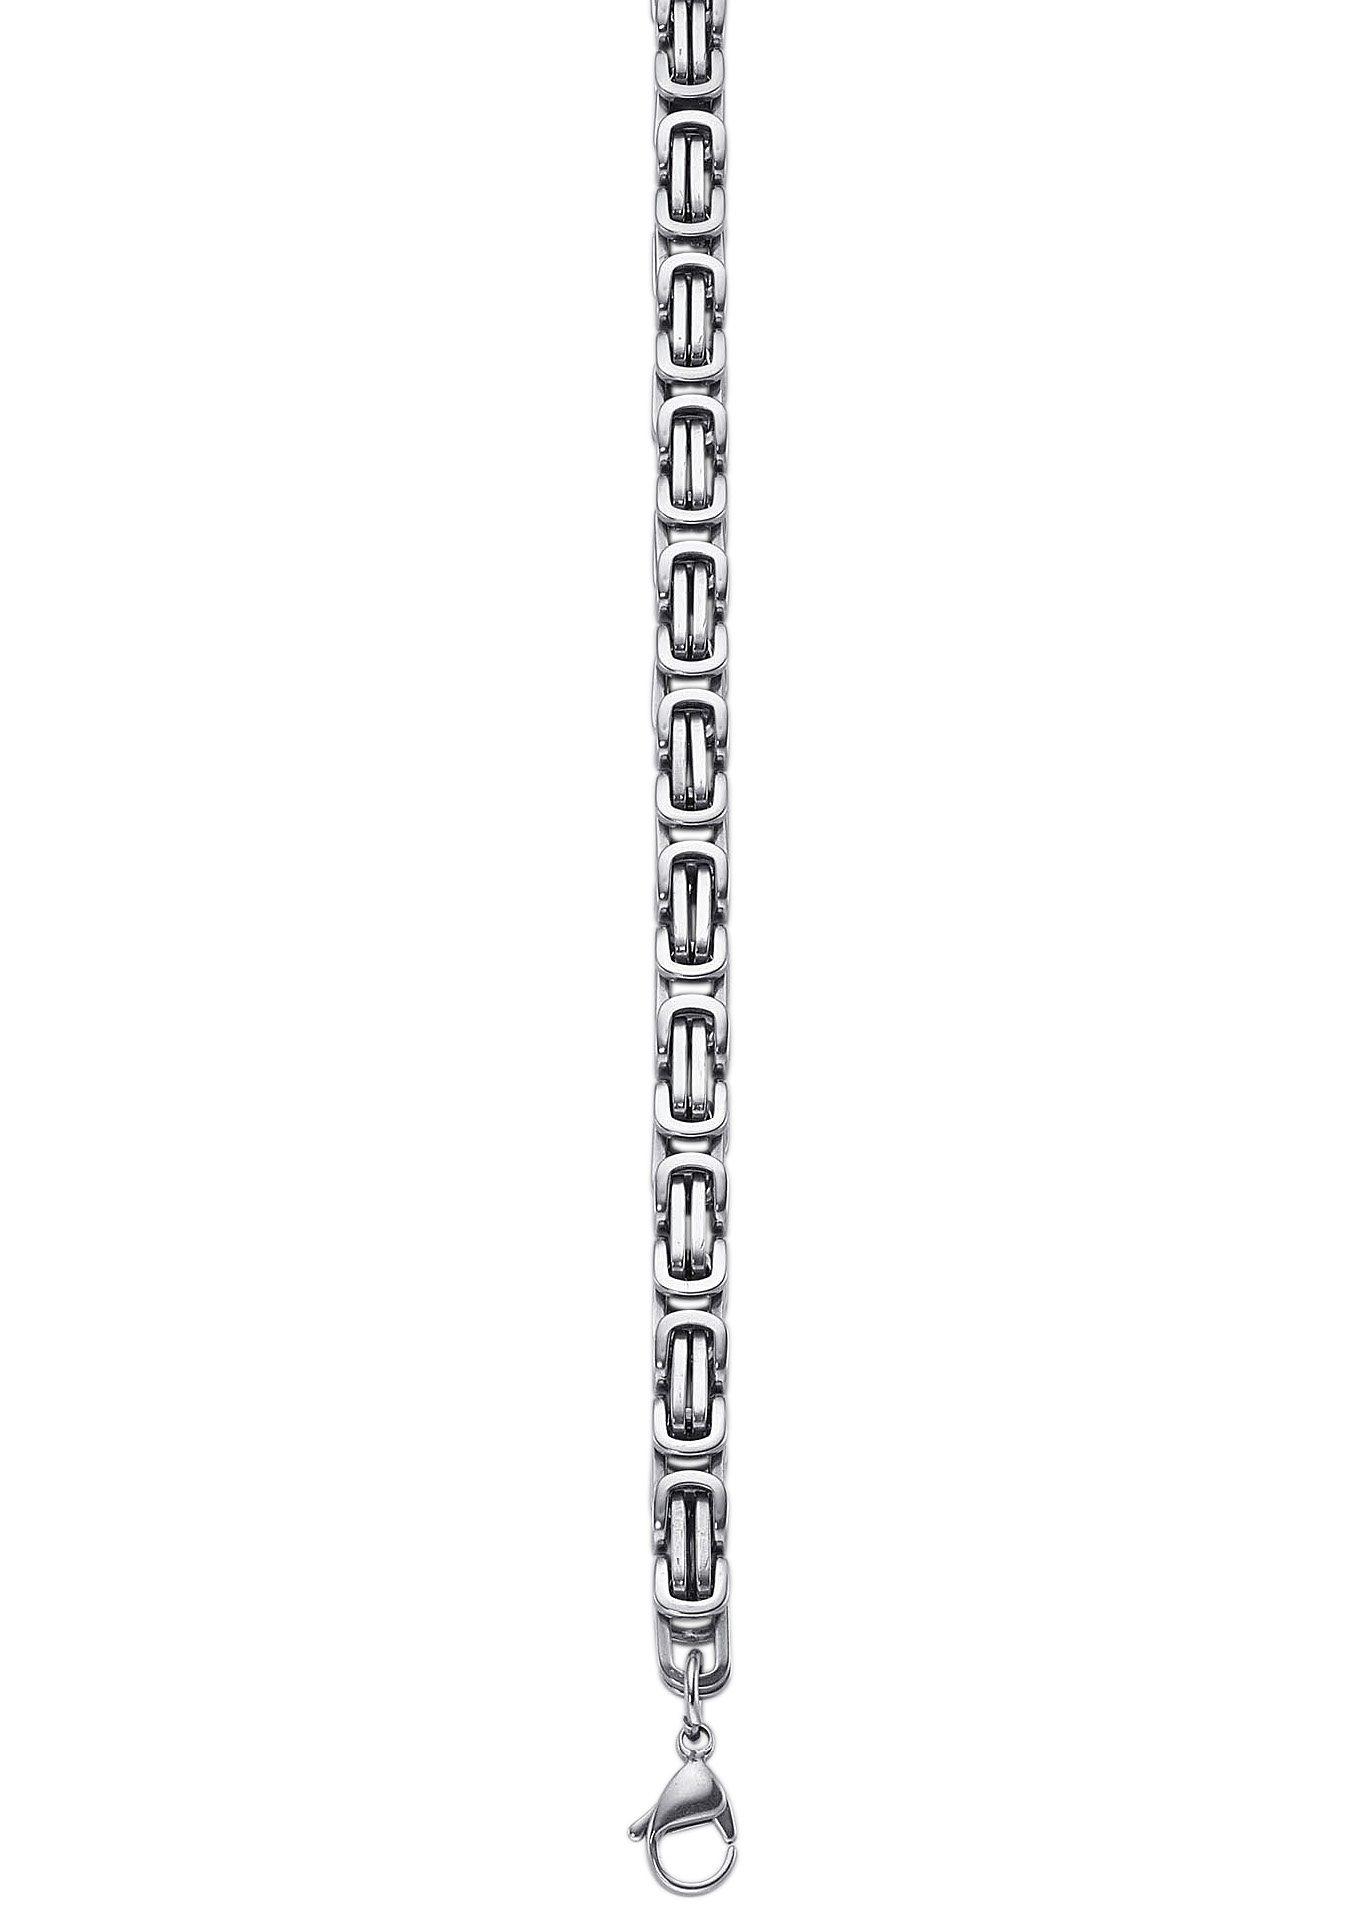 Armschmuck: Armband in Königskettengliederung